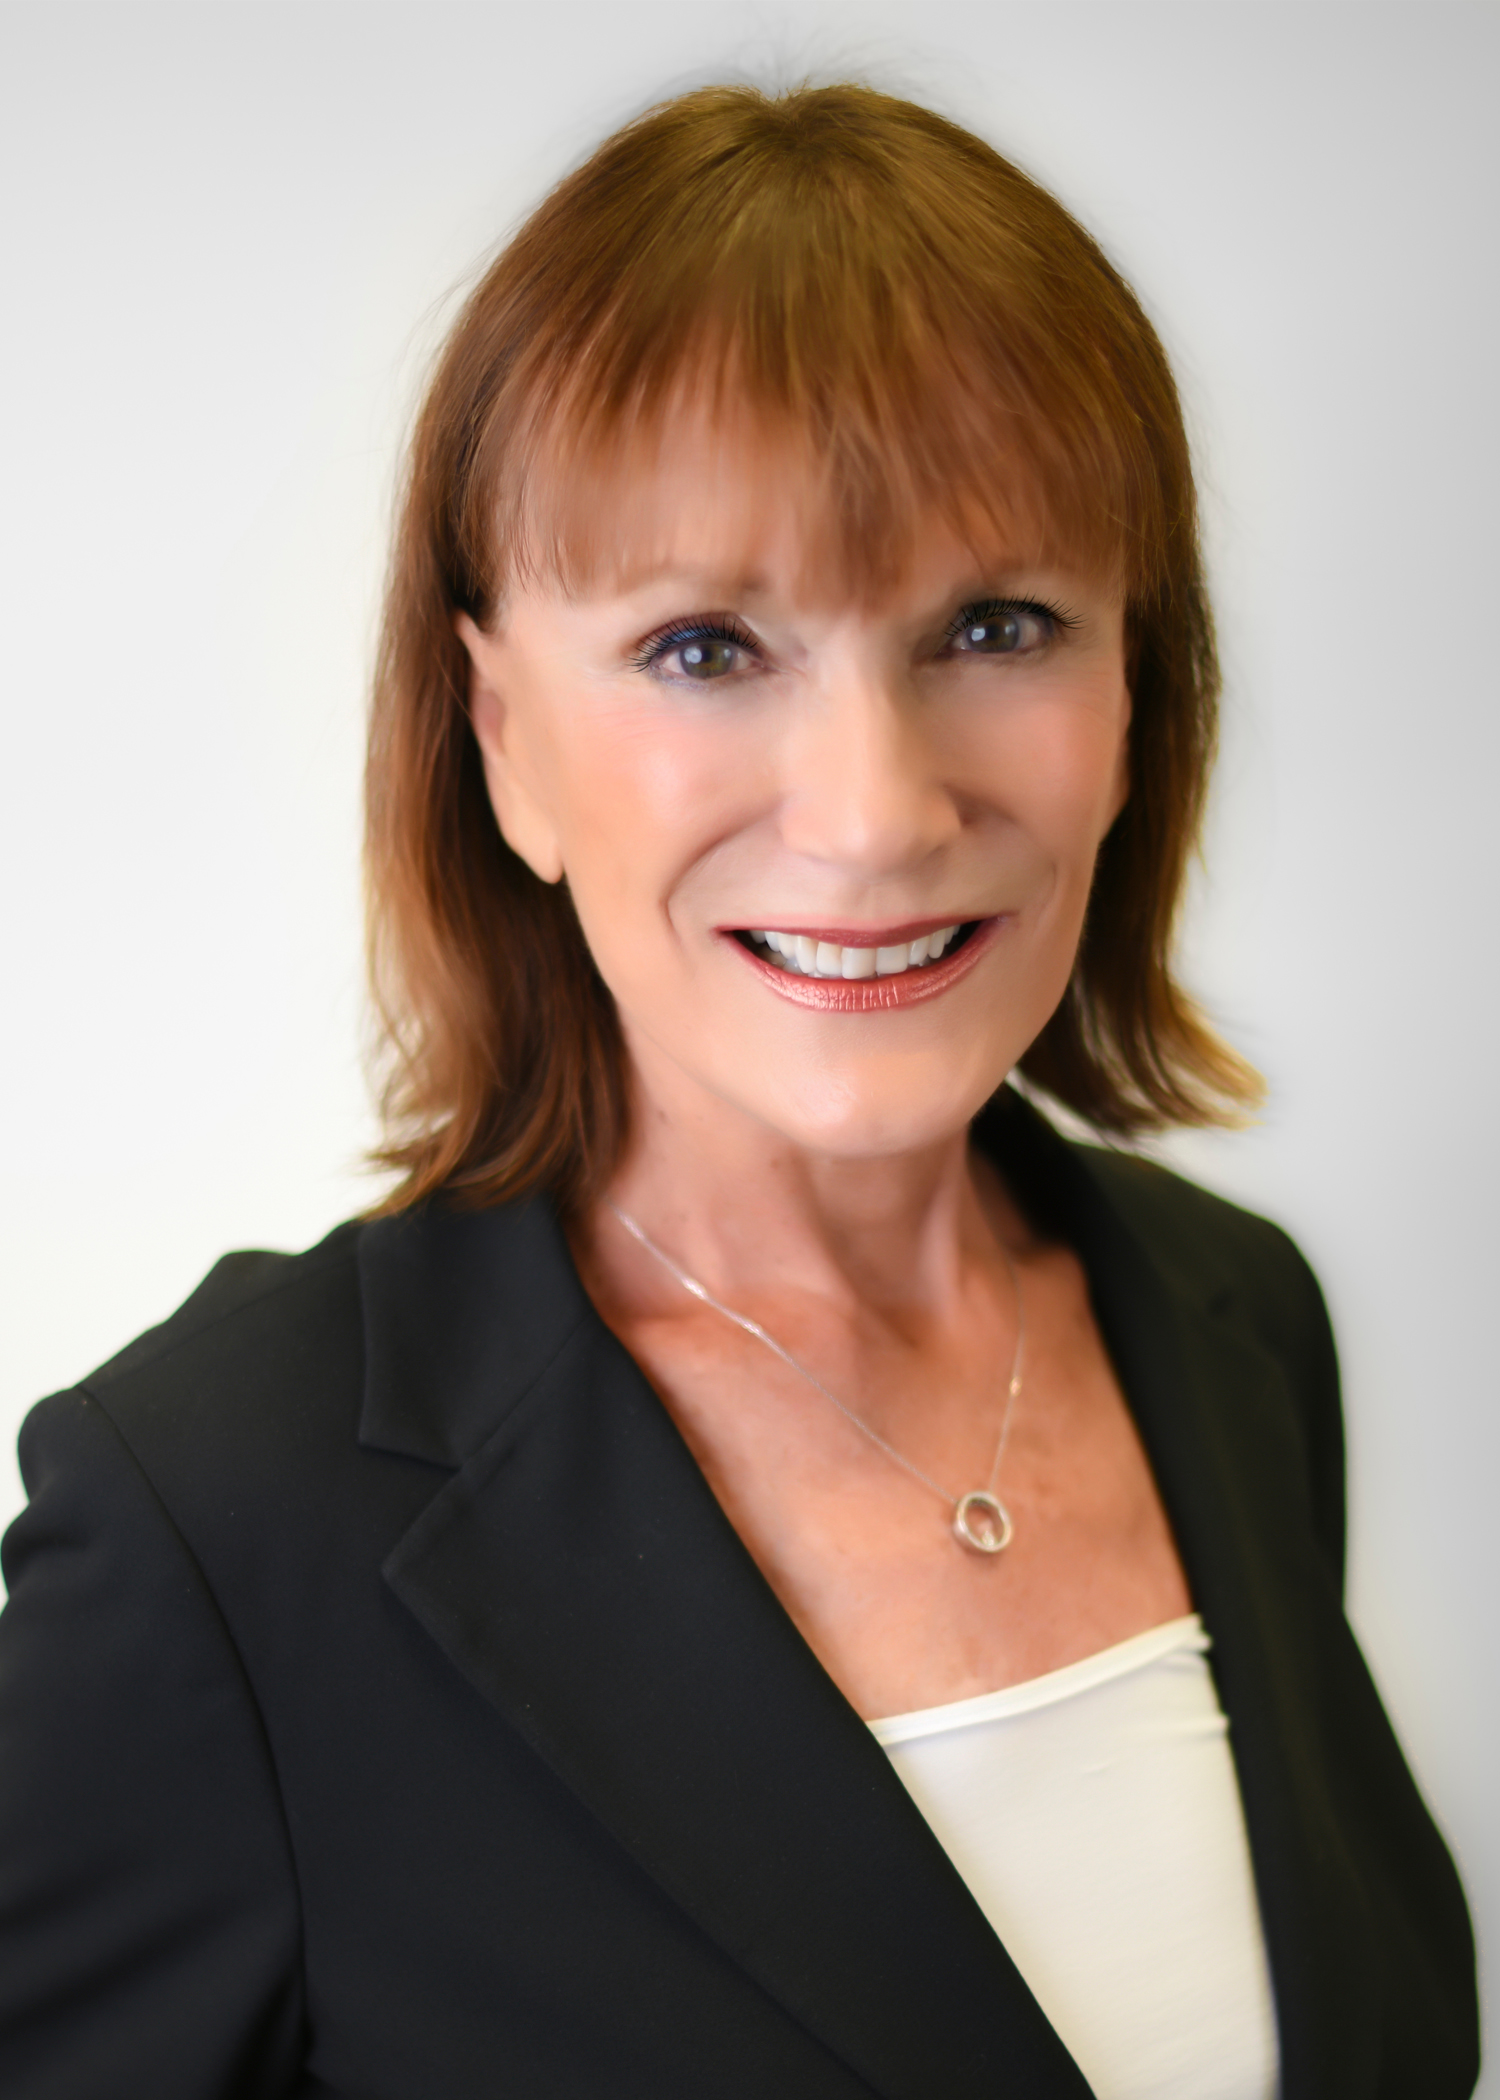 Sydney Phillips   ,   Business Development   (858) 775-3051   Email Sydney